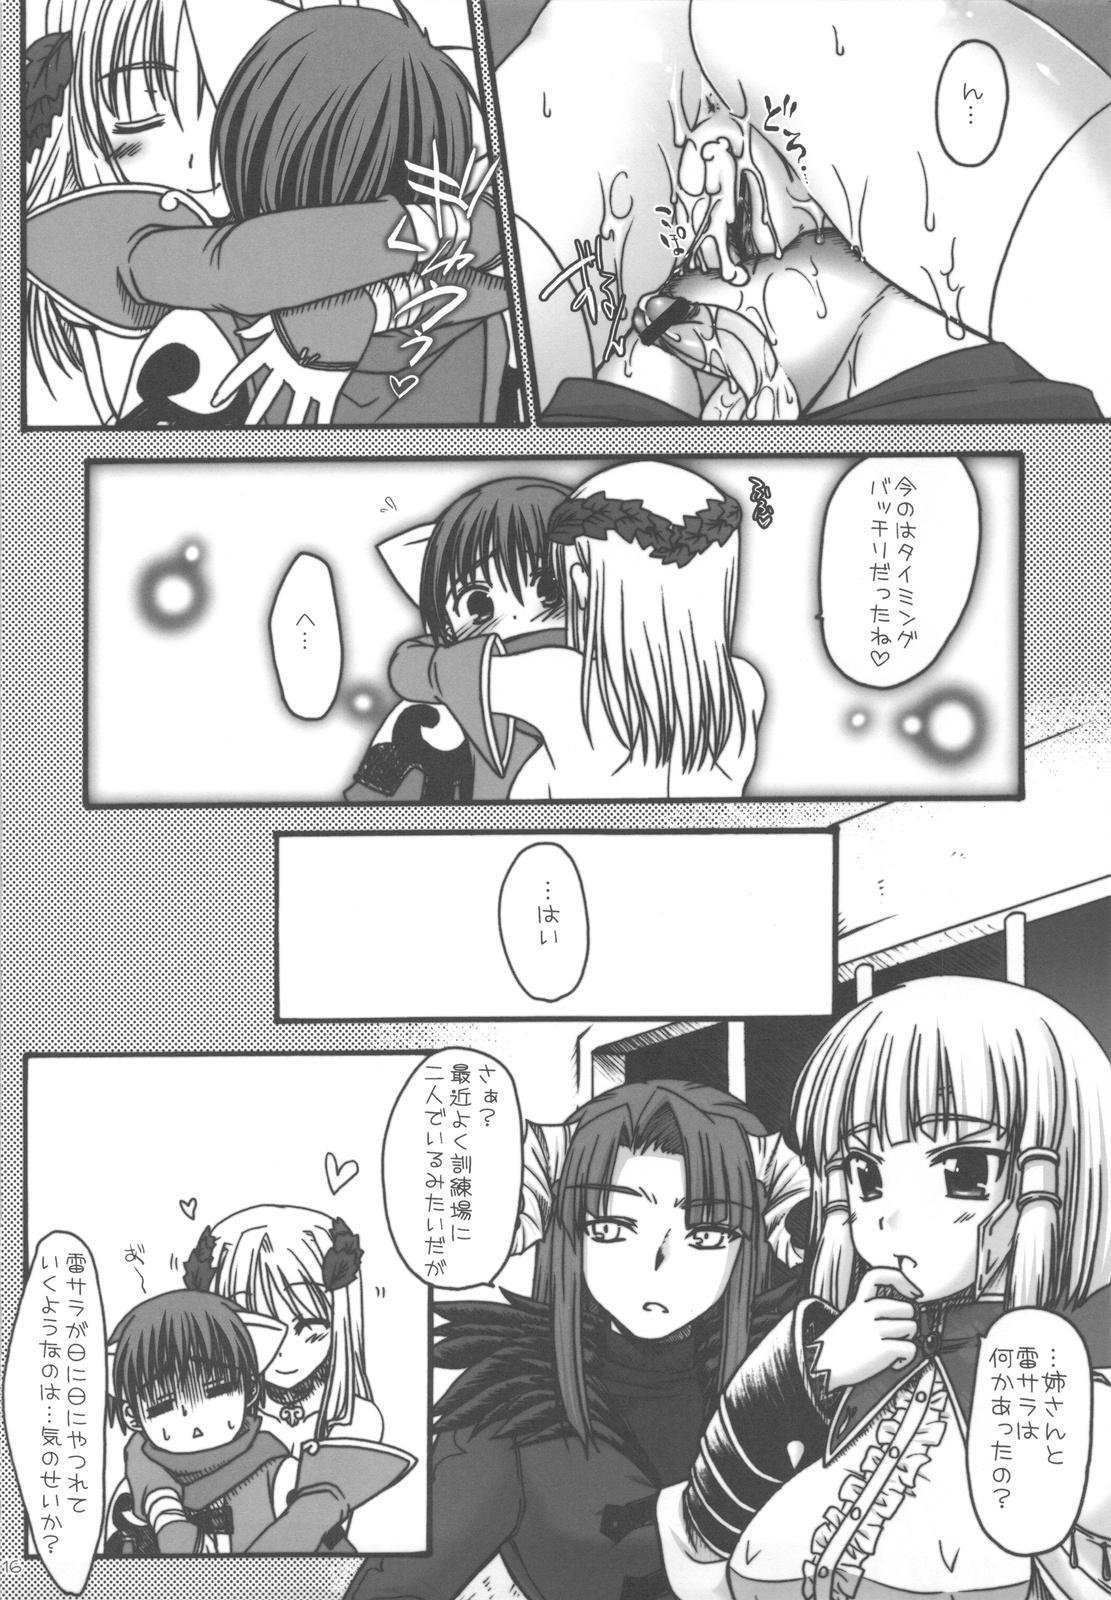 (C75) [Iiwake Gaisya (Shigemiya Kyouhei)] Koori Sara-san to Kaminari Sara-kun. (Fantasy Earth Zero) 14